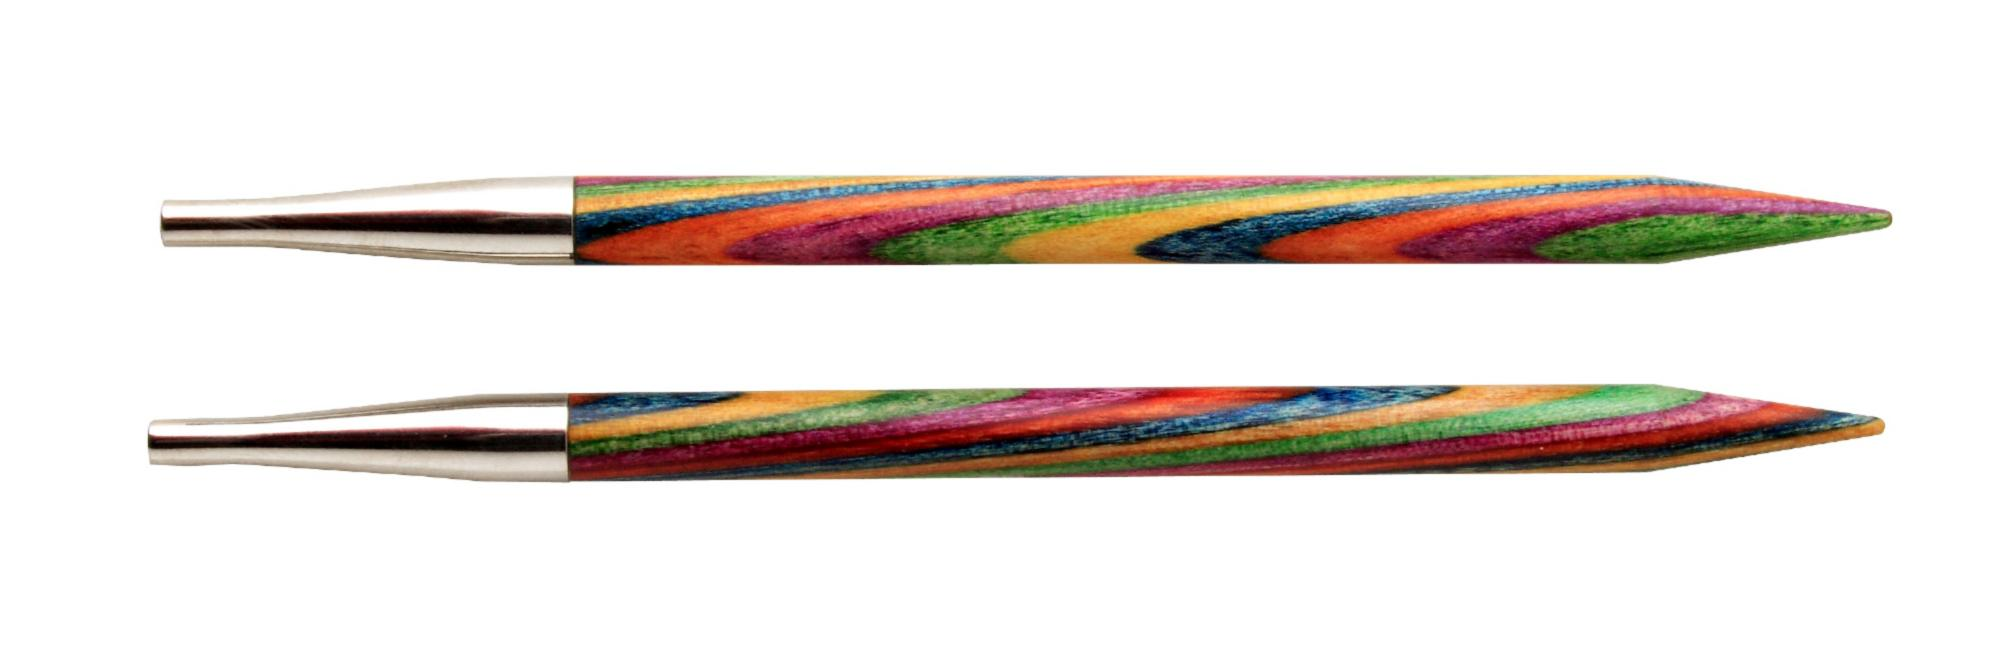 Спицы съемные короткие Symfonie Wood KnitPro, 20427, 5.50 мм